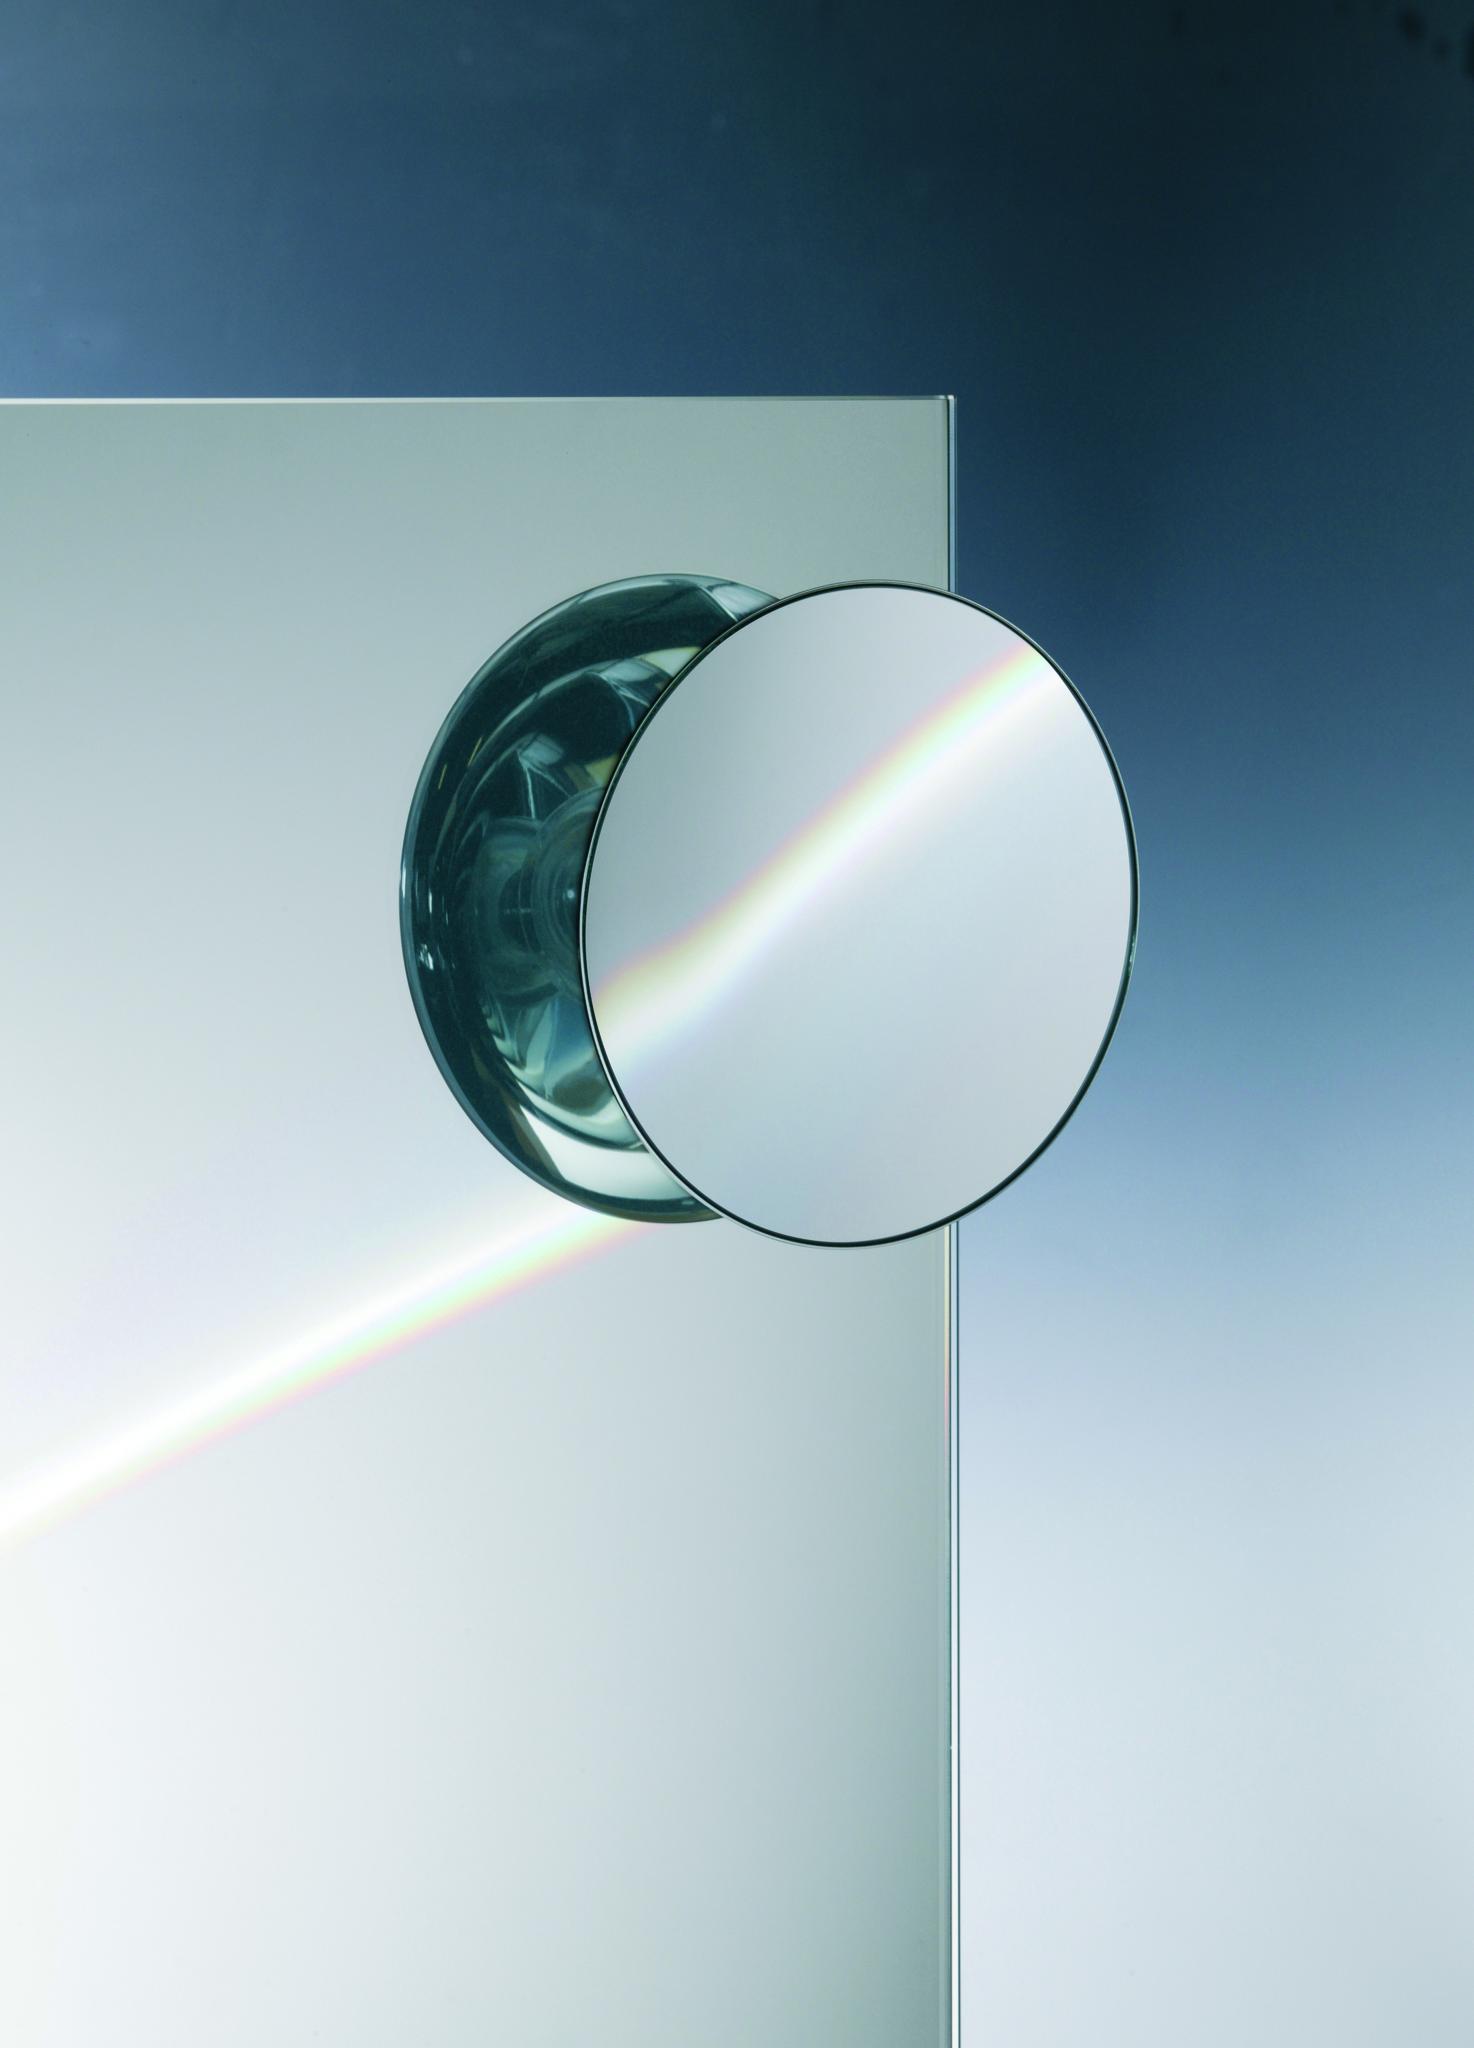 Зеркала Зеркало косметическое на присосках Windisch 99303CR 5X elitnoe-zerkalo-kosmeticheskoe-na-prisoskah-99303-ot-windisch-ispaniya.jpg